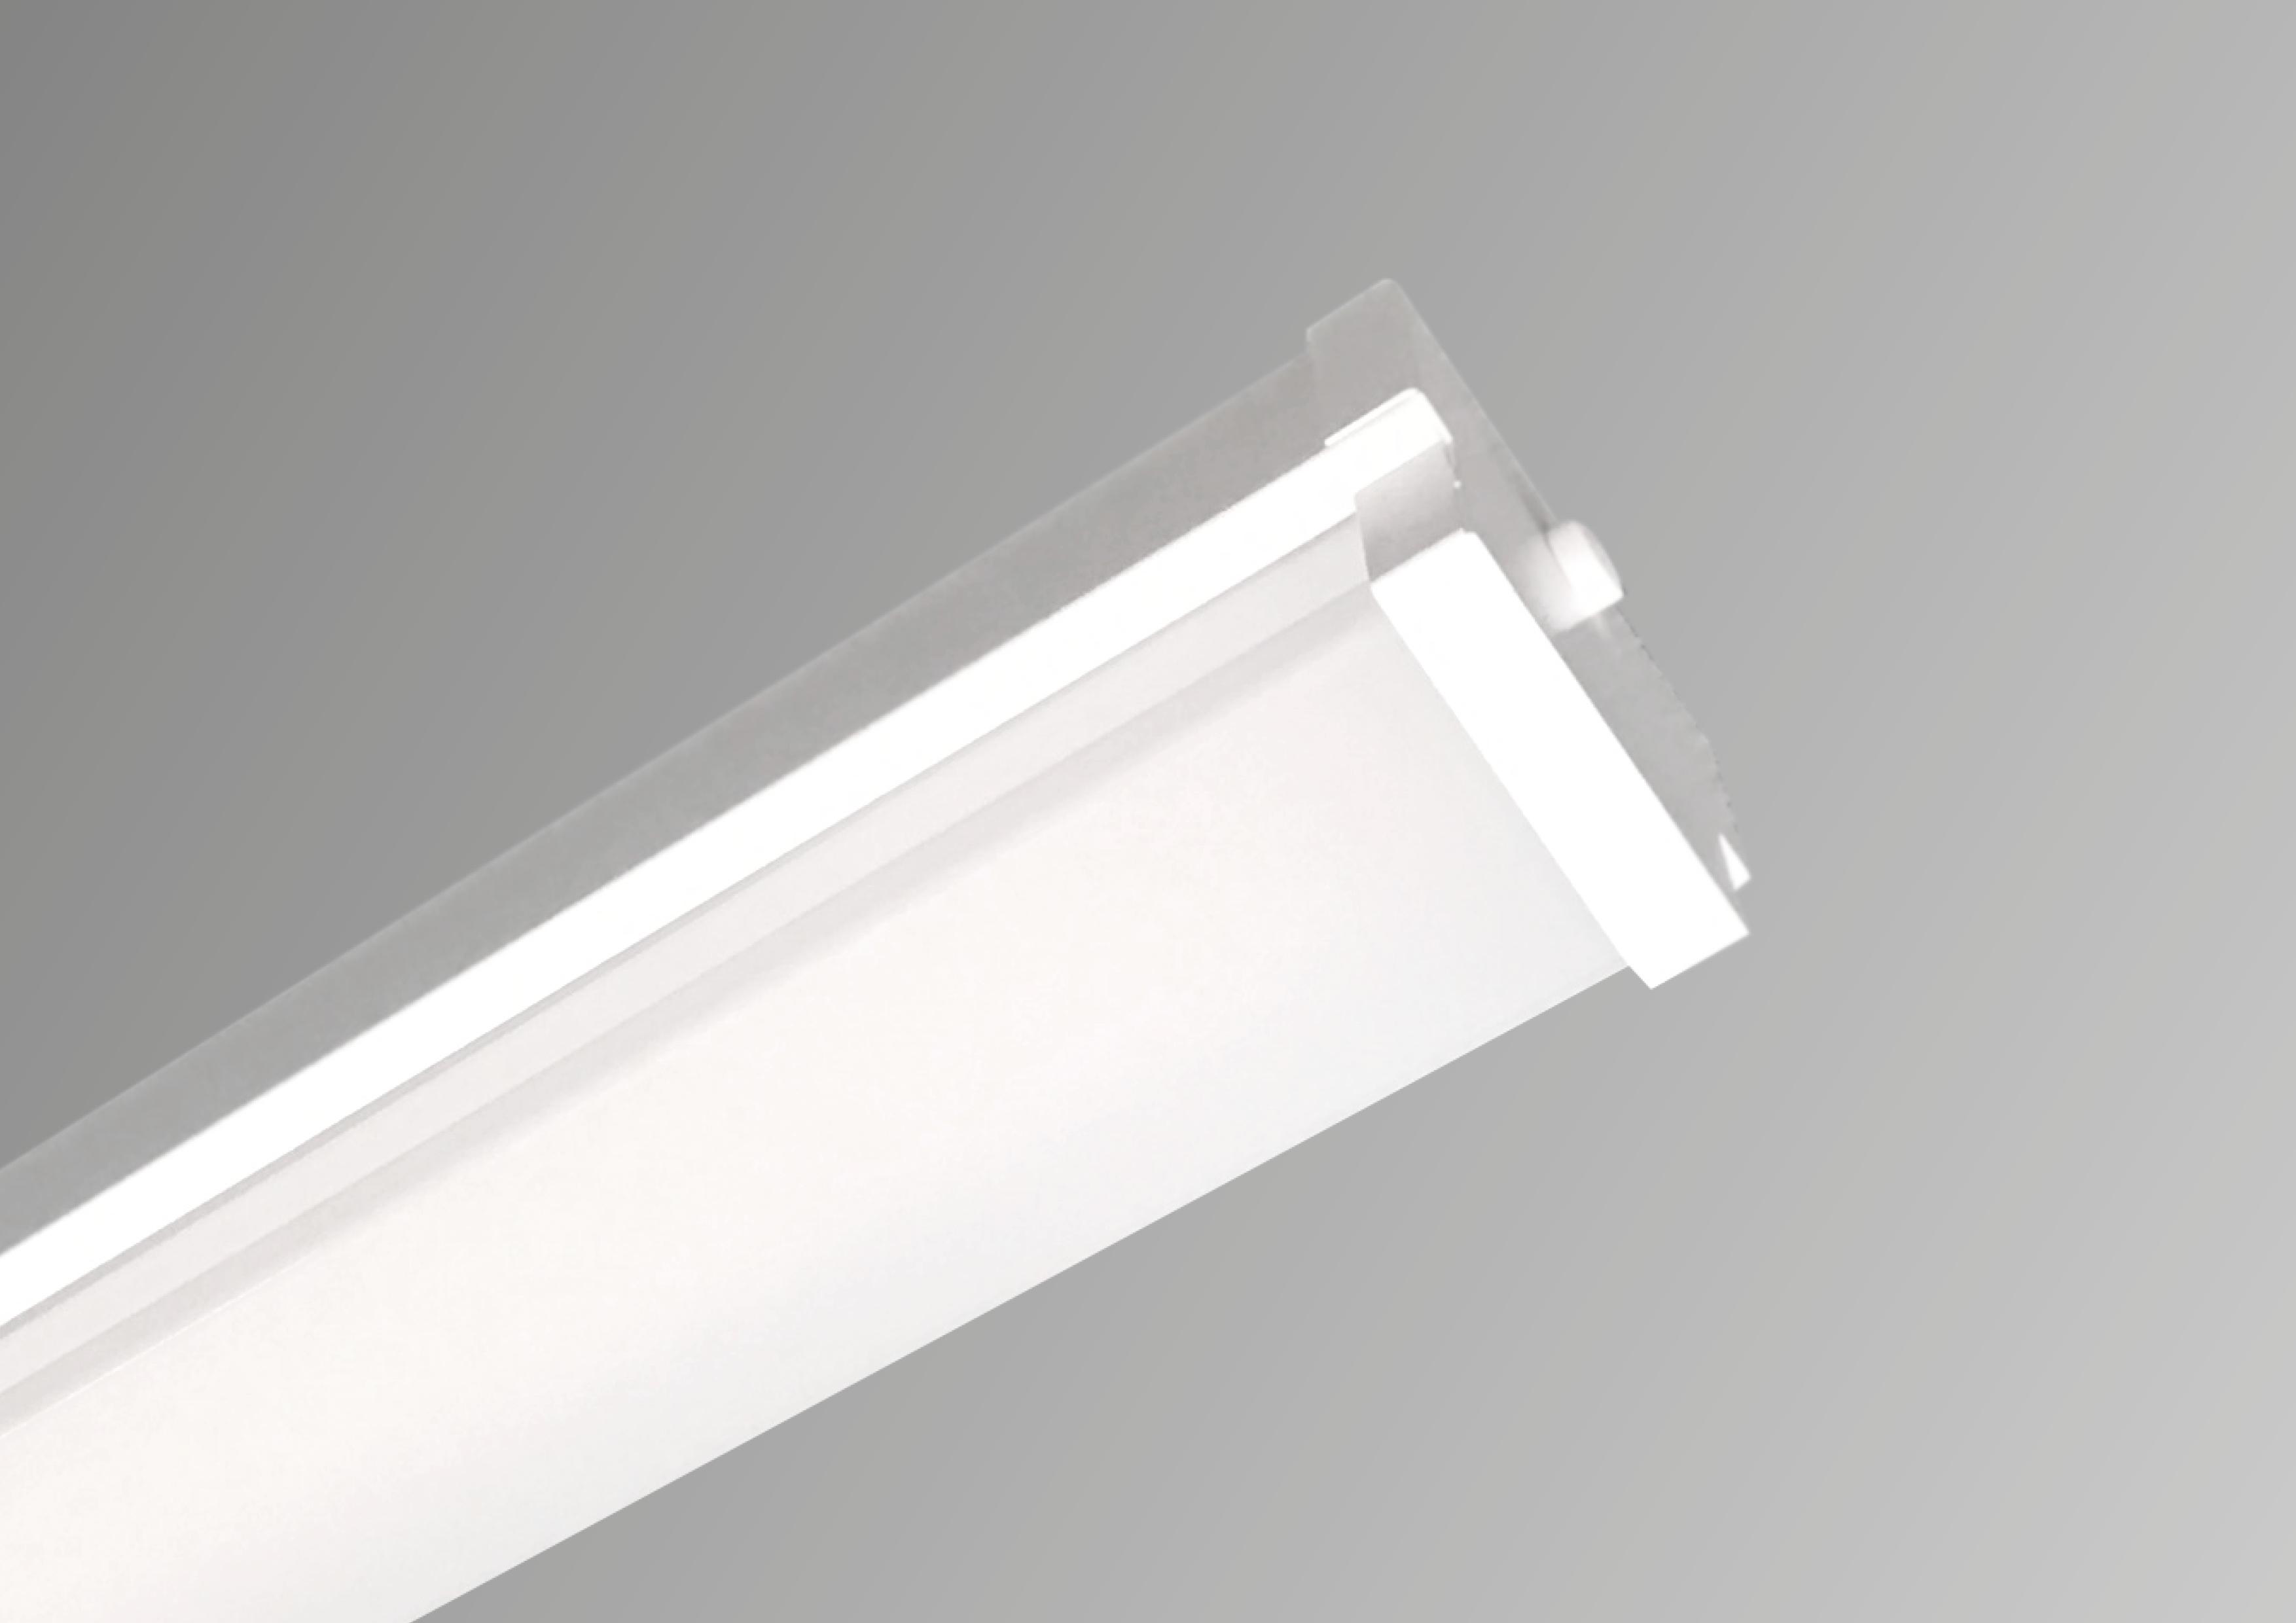 https://contrac-lighting.co.uk/wp-content/uploads/2019/03/ACADEMY-SIDE.jpg